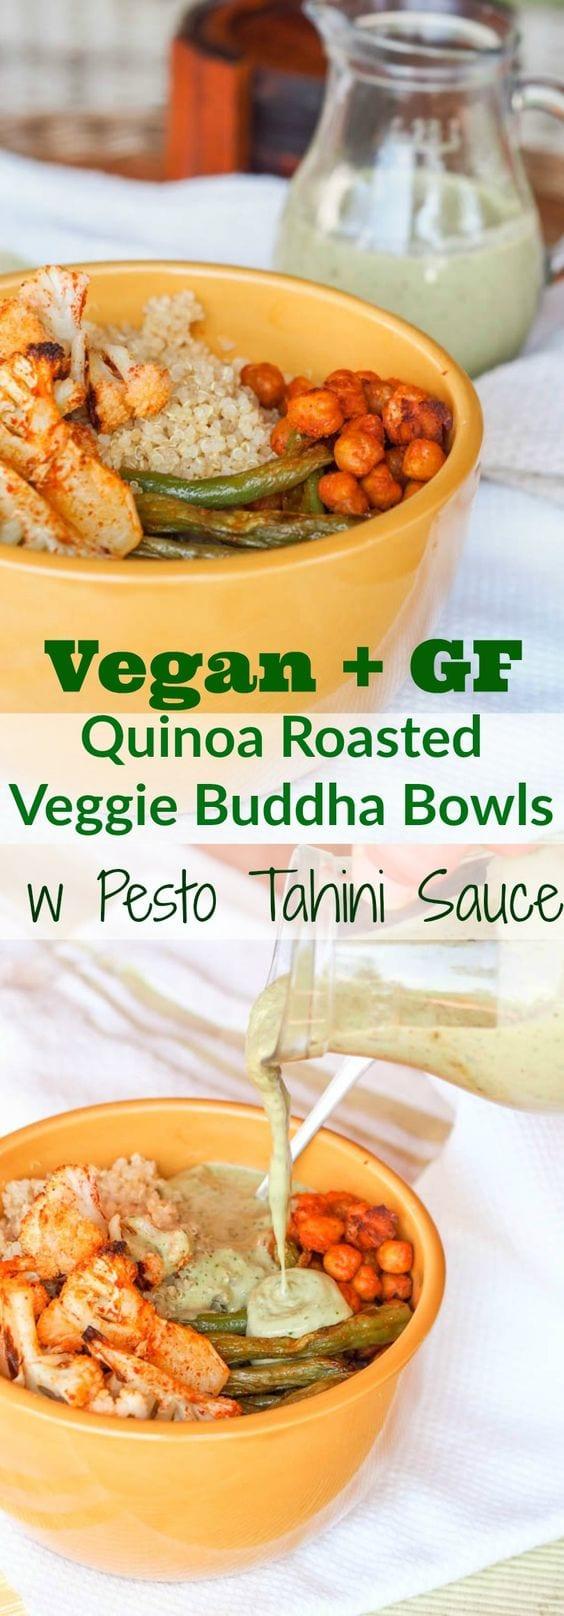 vegan buddha bowls pin